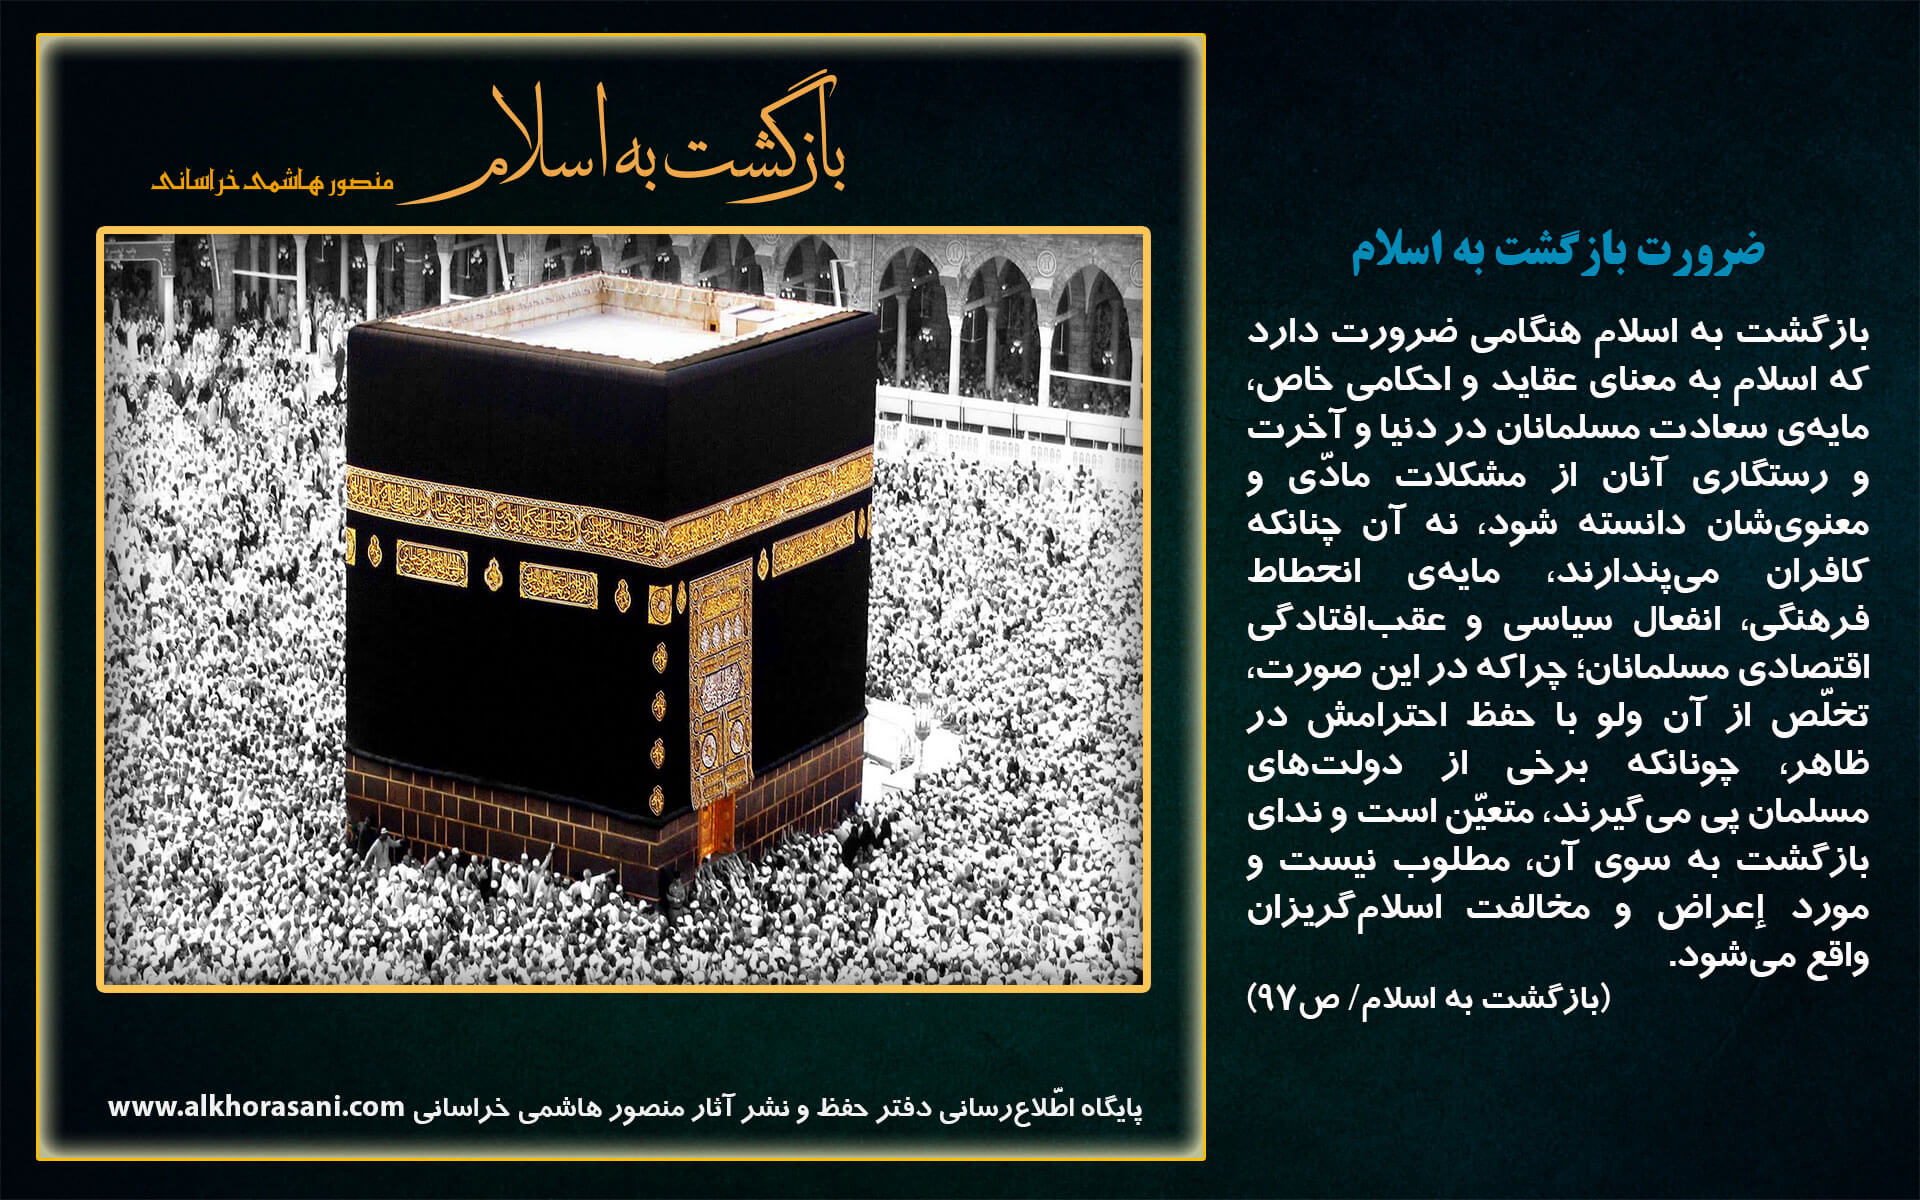 ضرورت بازگشت به اسلام